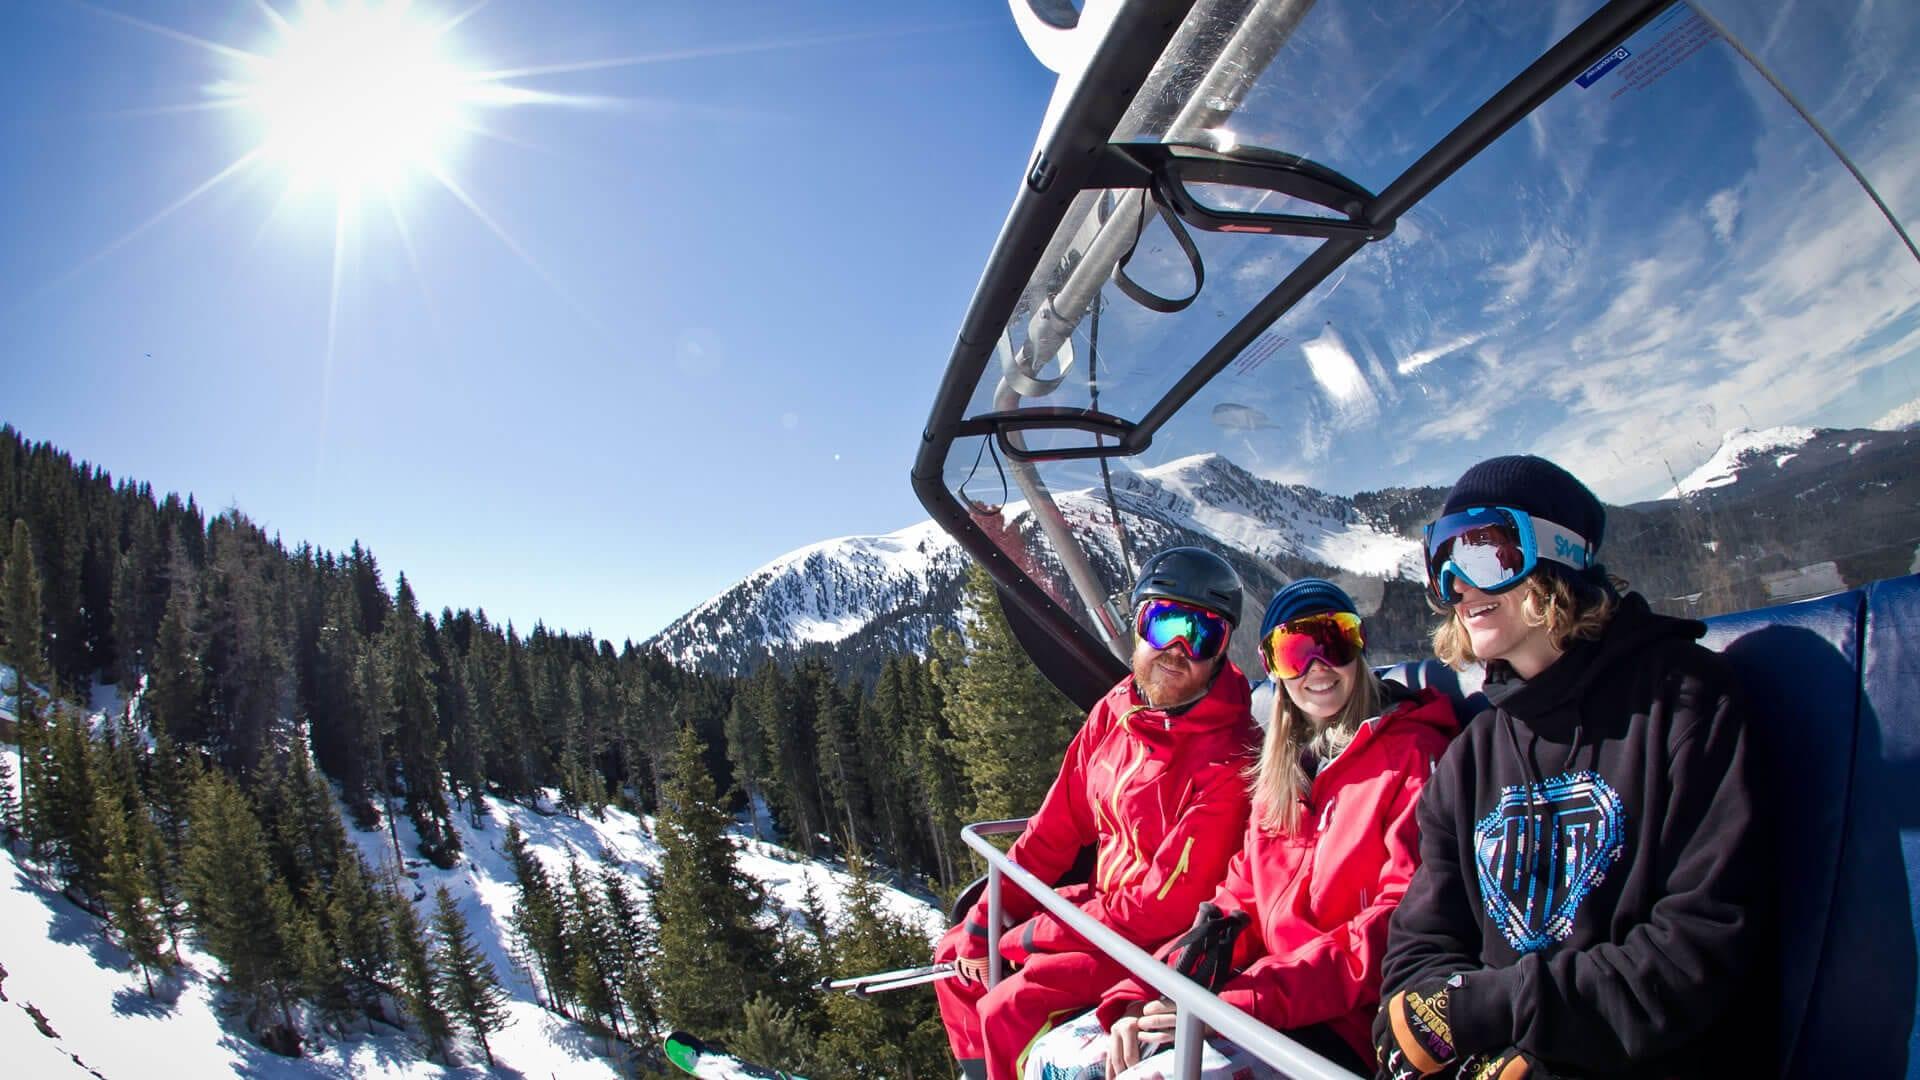 Dolomiti supersun: tintarella & apré ski